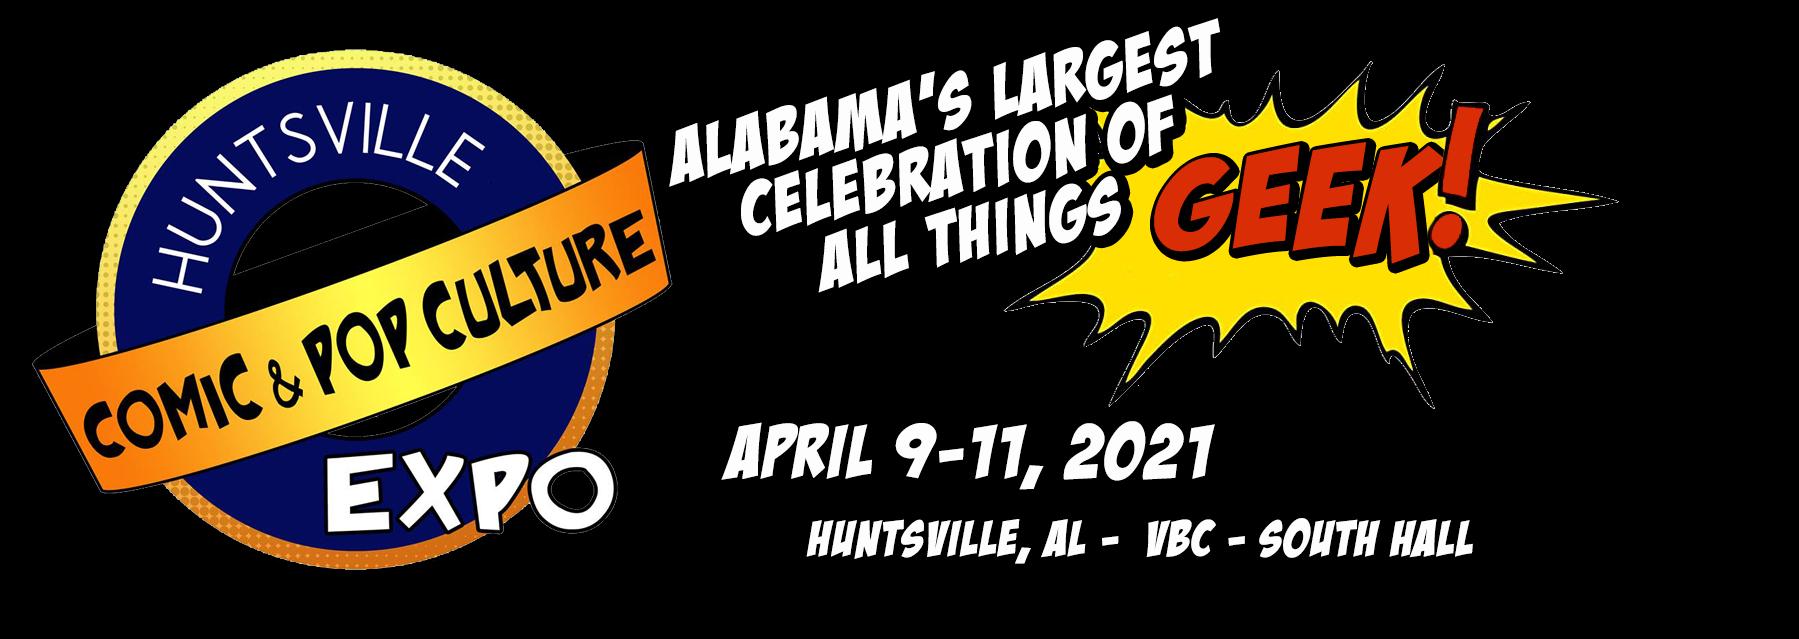 Huntsville Comic and Pop Culture Expo